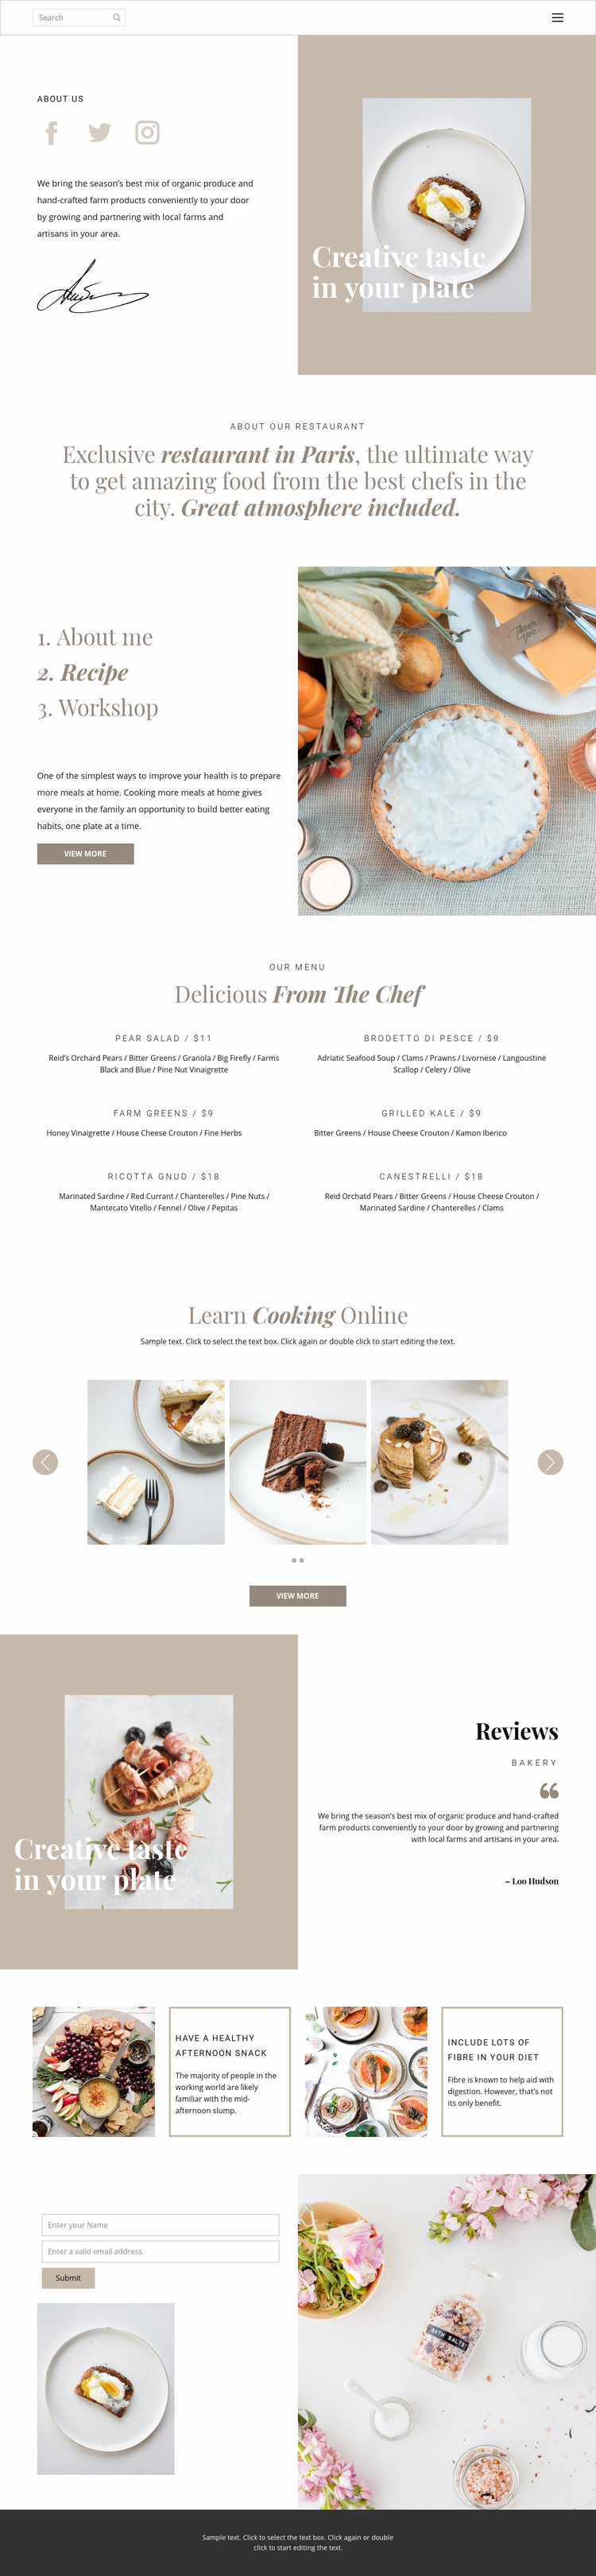 Creative taste in plate Web Page Design